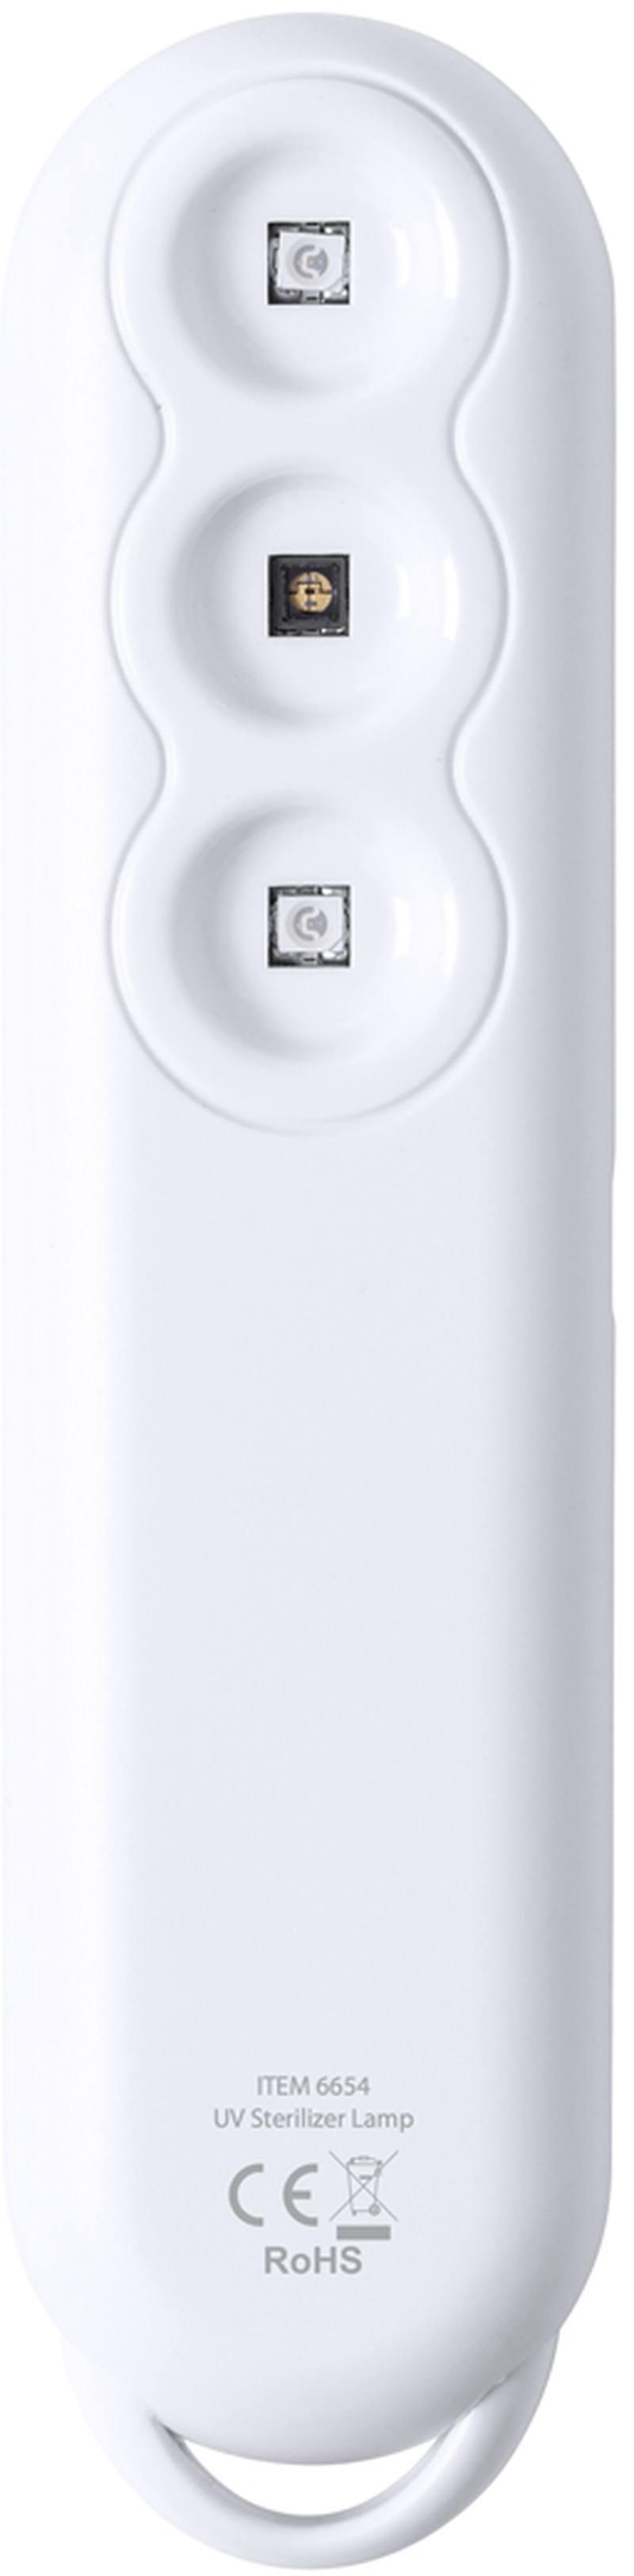 Uv sterilizační lampa Nurek